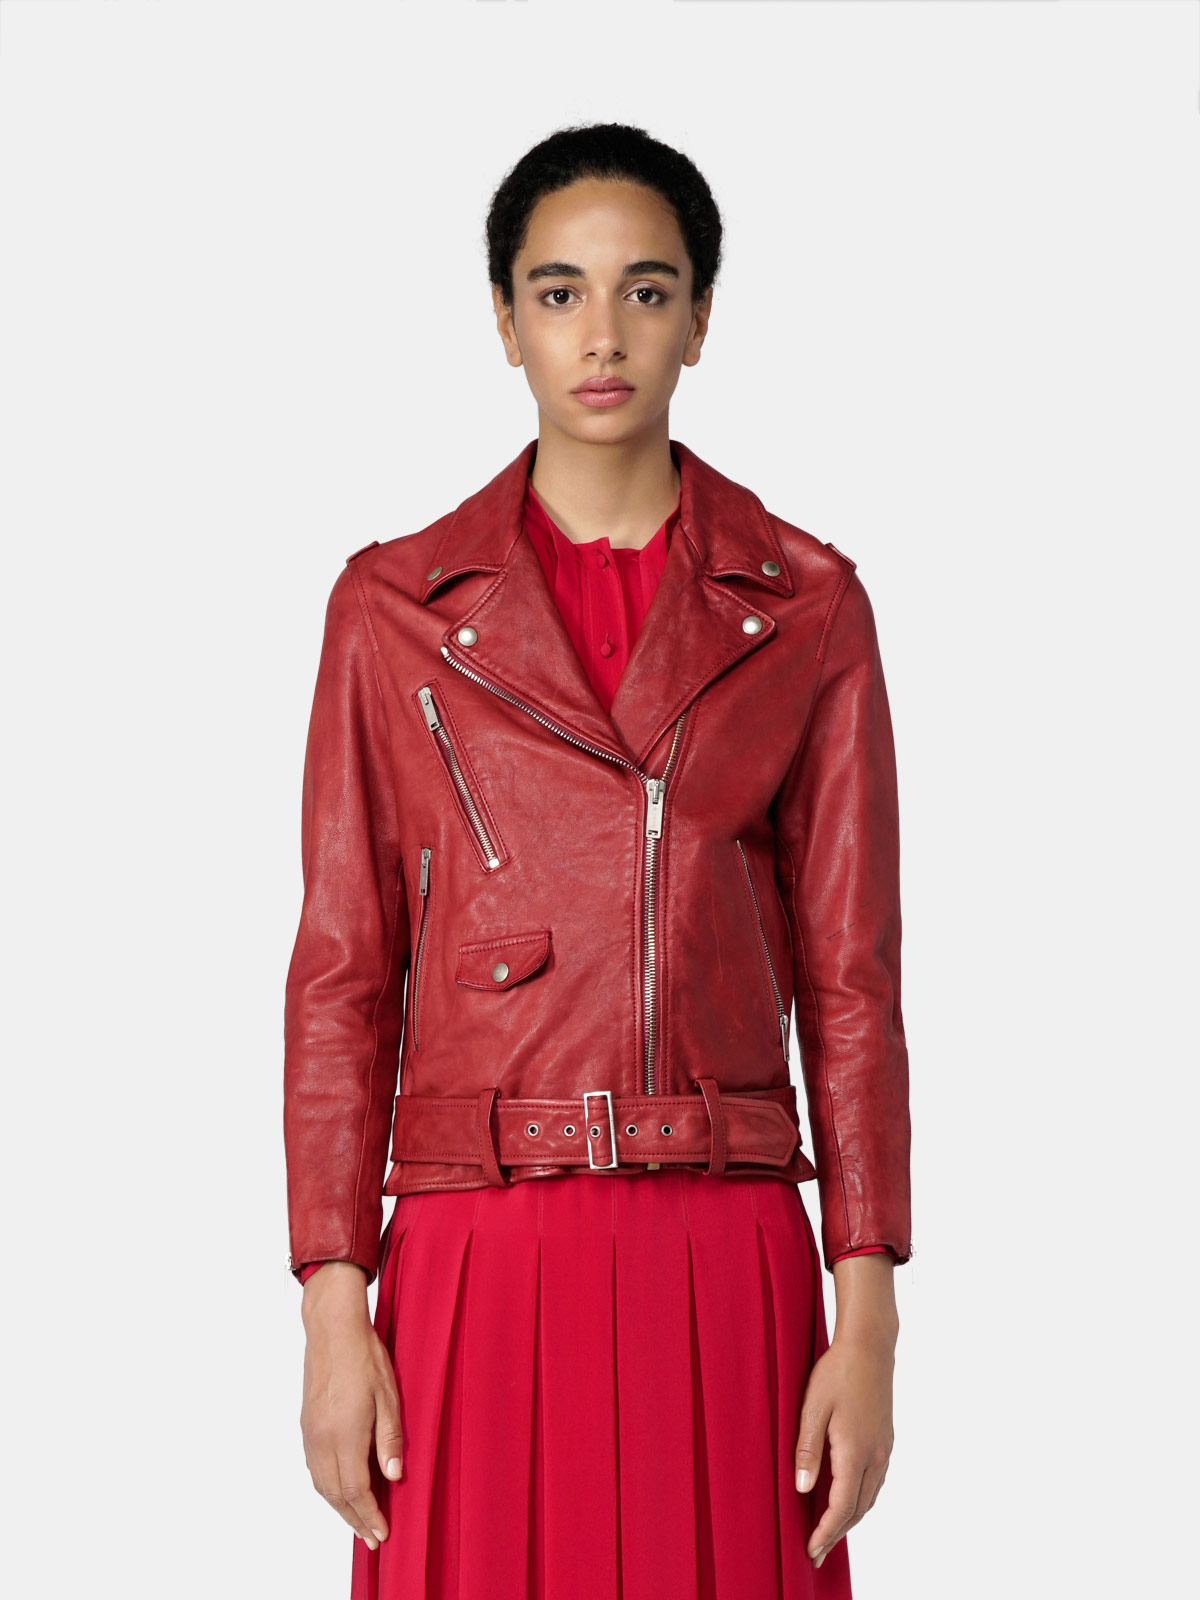 Golden Goose - Golden biker jacket in red vegetable-tanned nappa leather in